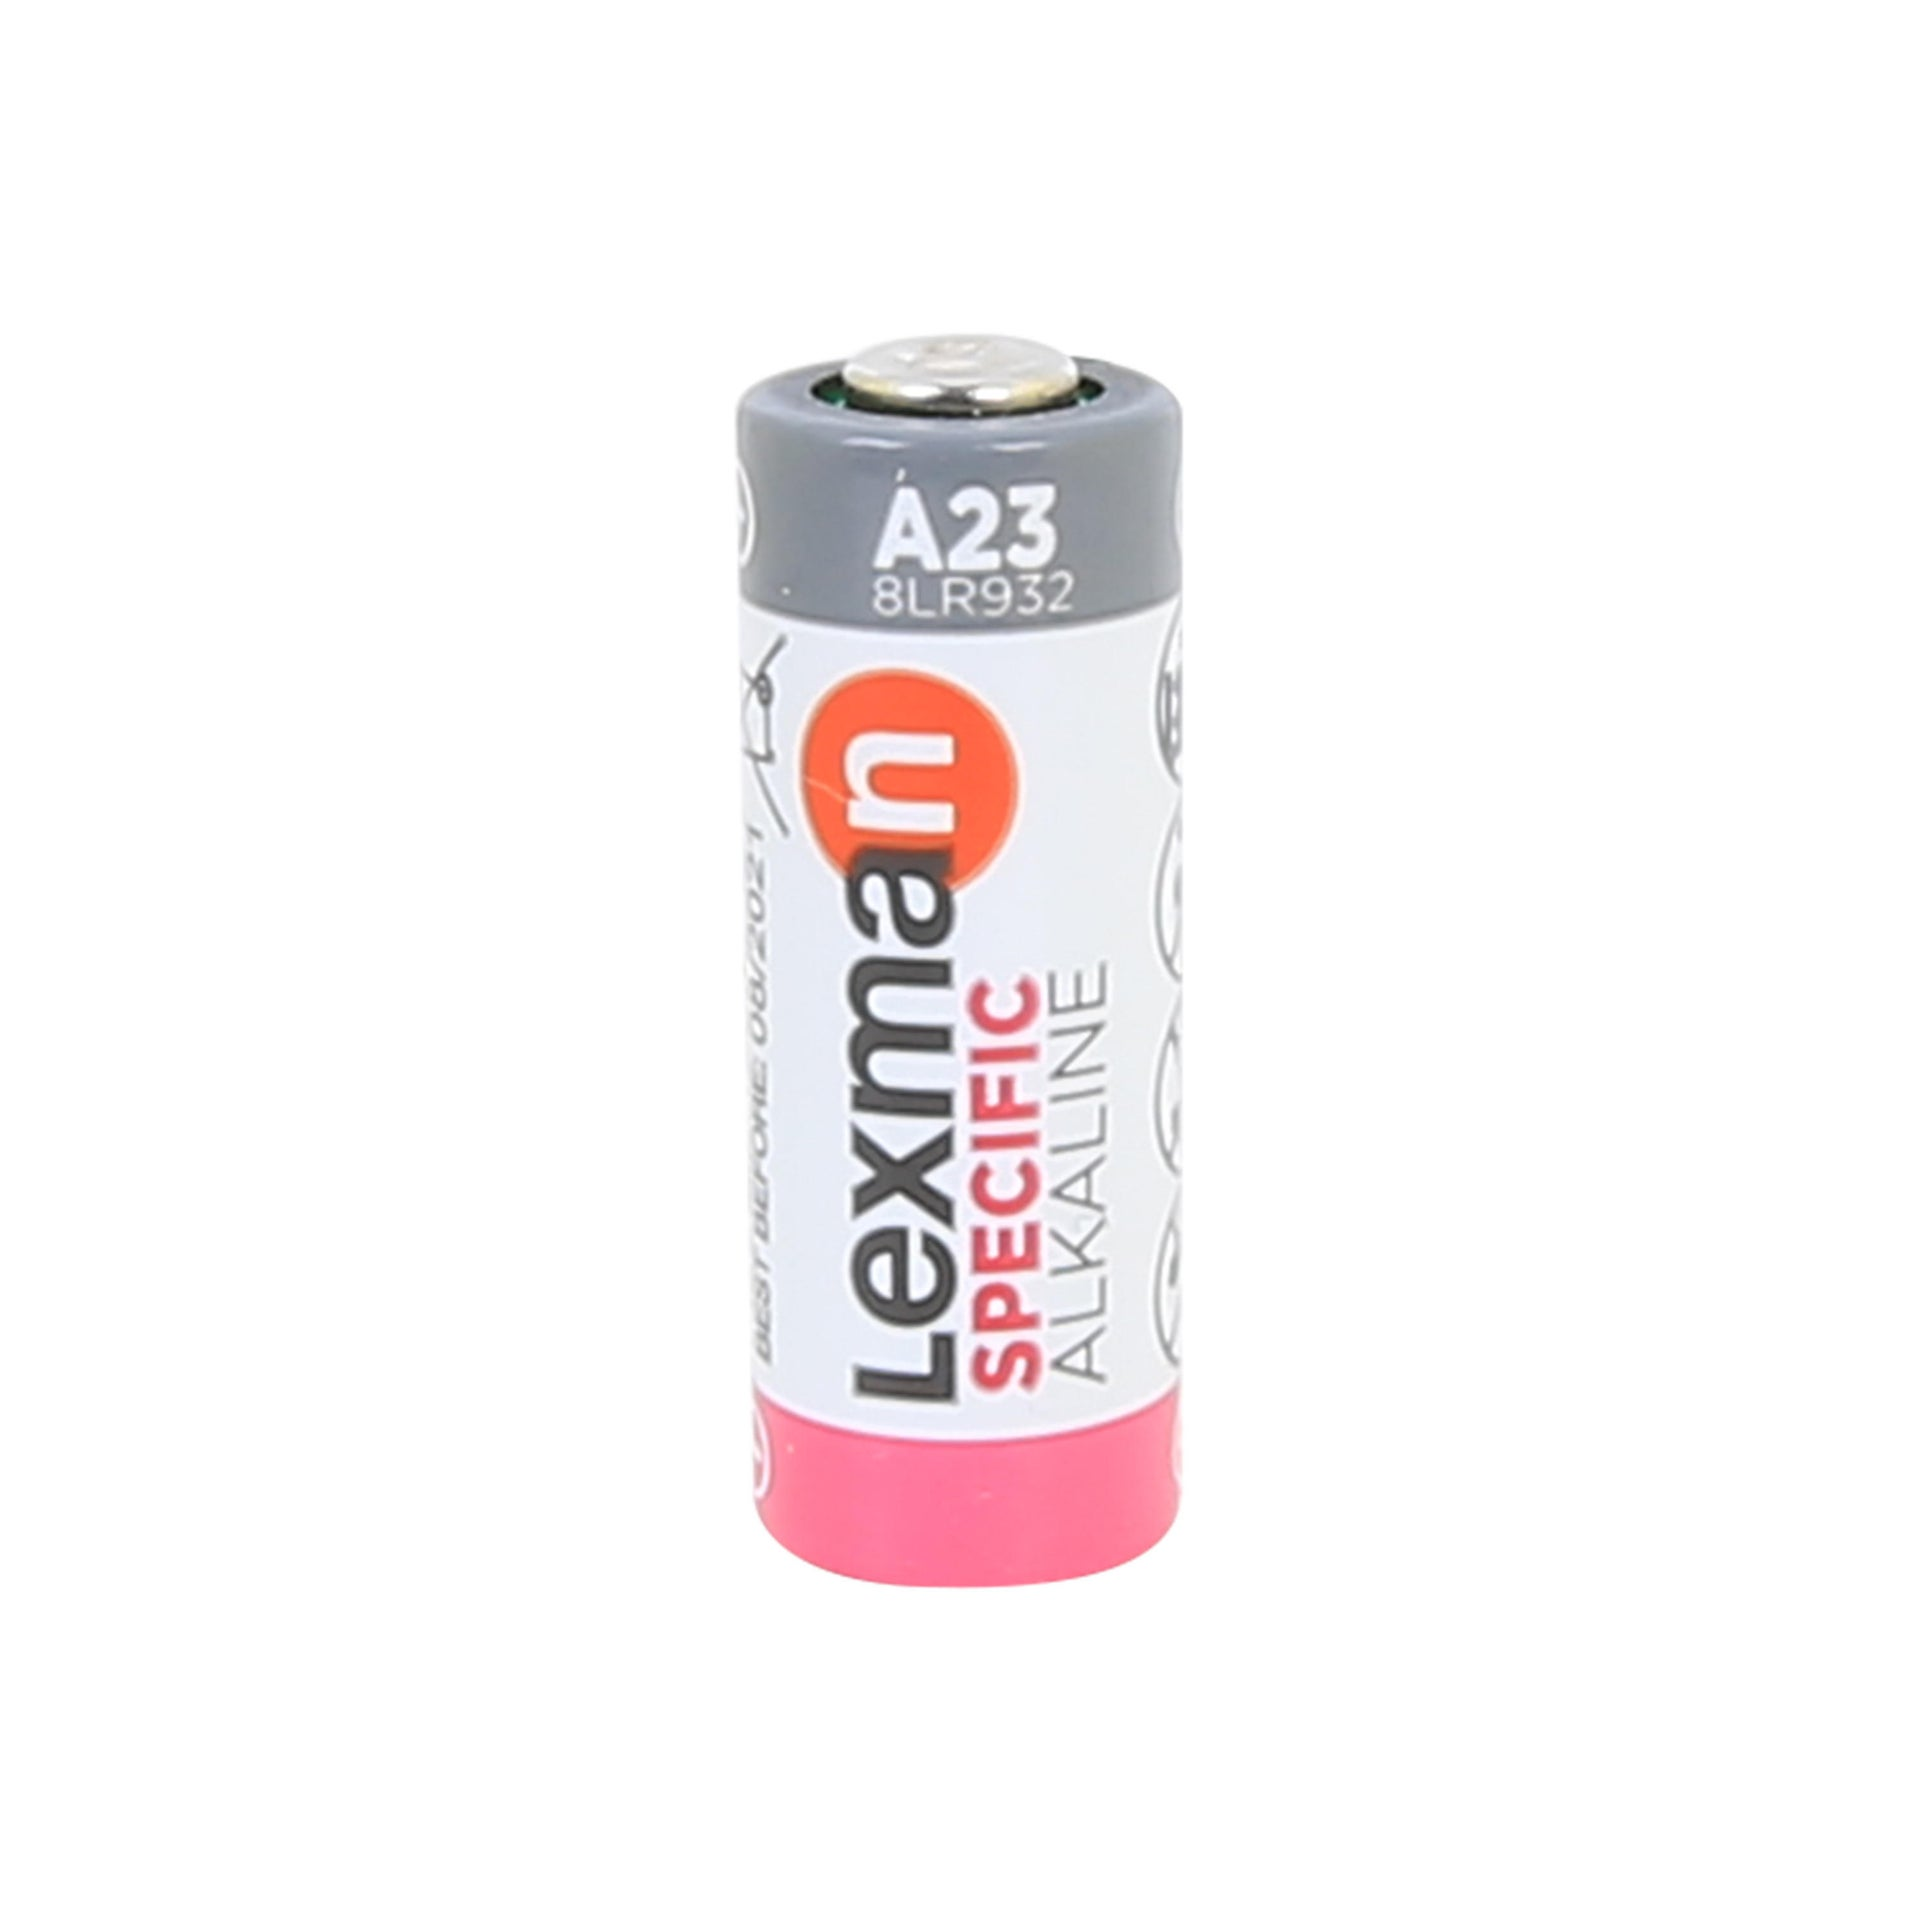 Pila alcalina A23 LEXMAN 844968 1 batteria - 3